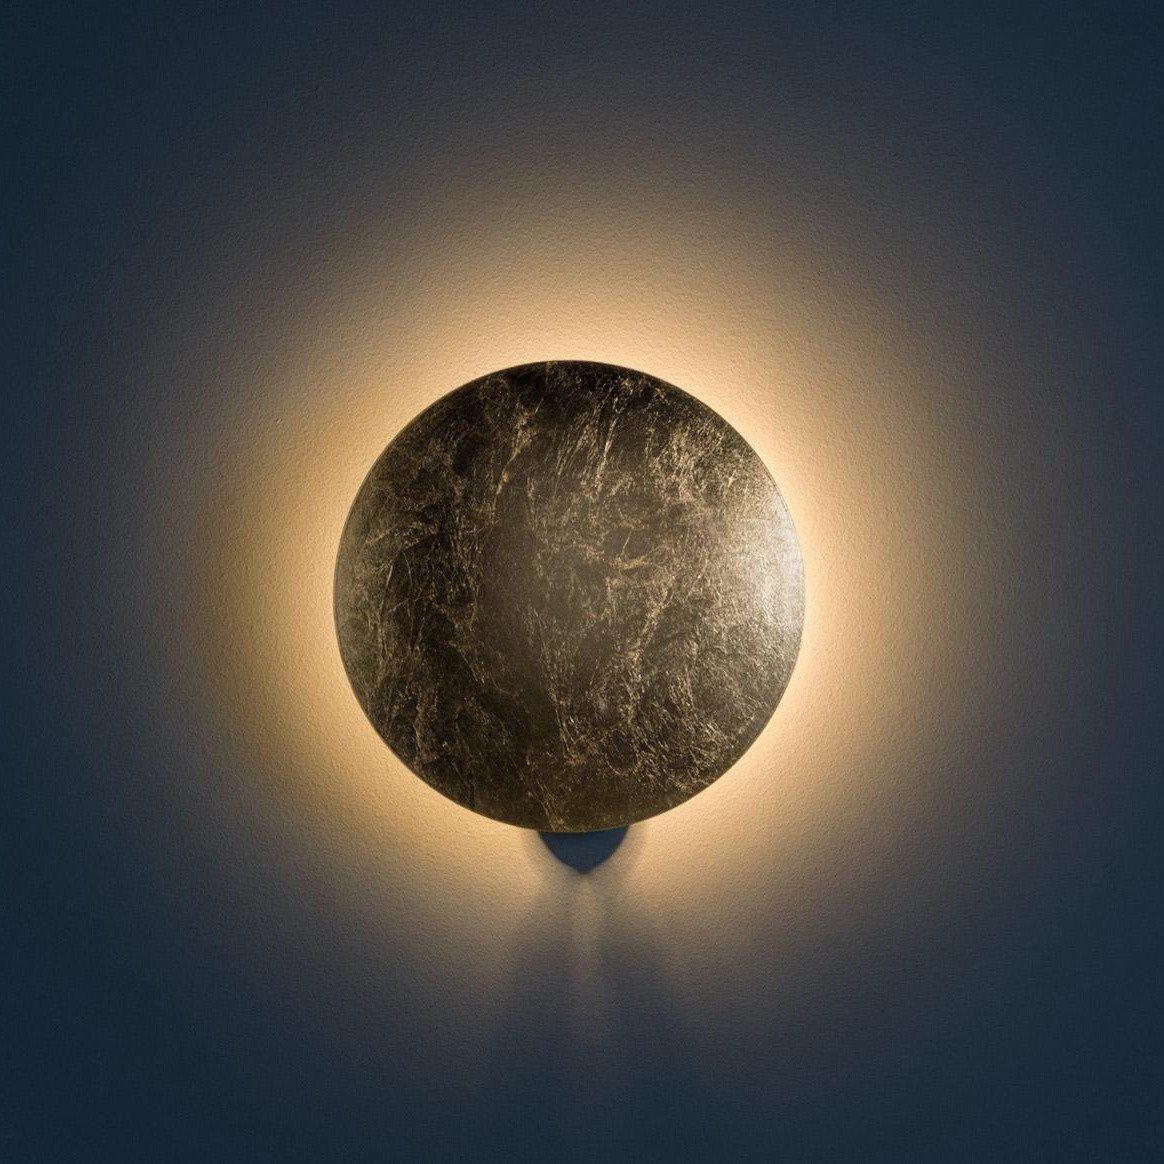 Lunar Eclipse Wall 3D Moon Lamp - Lamps & Lighting